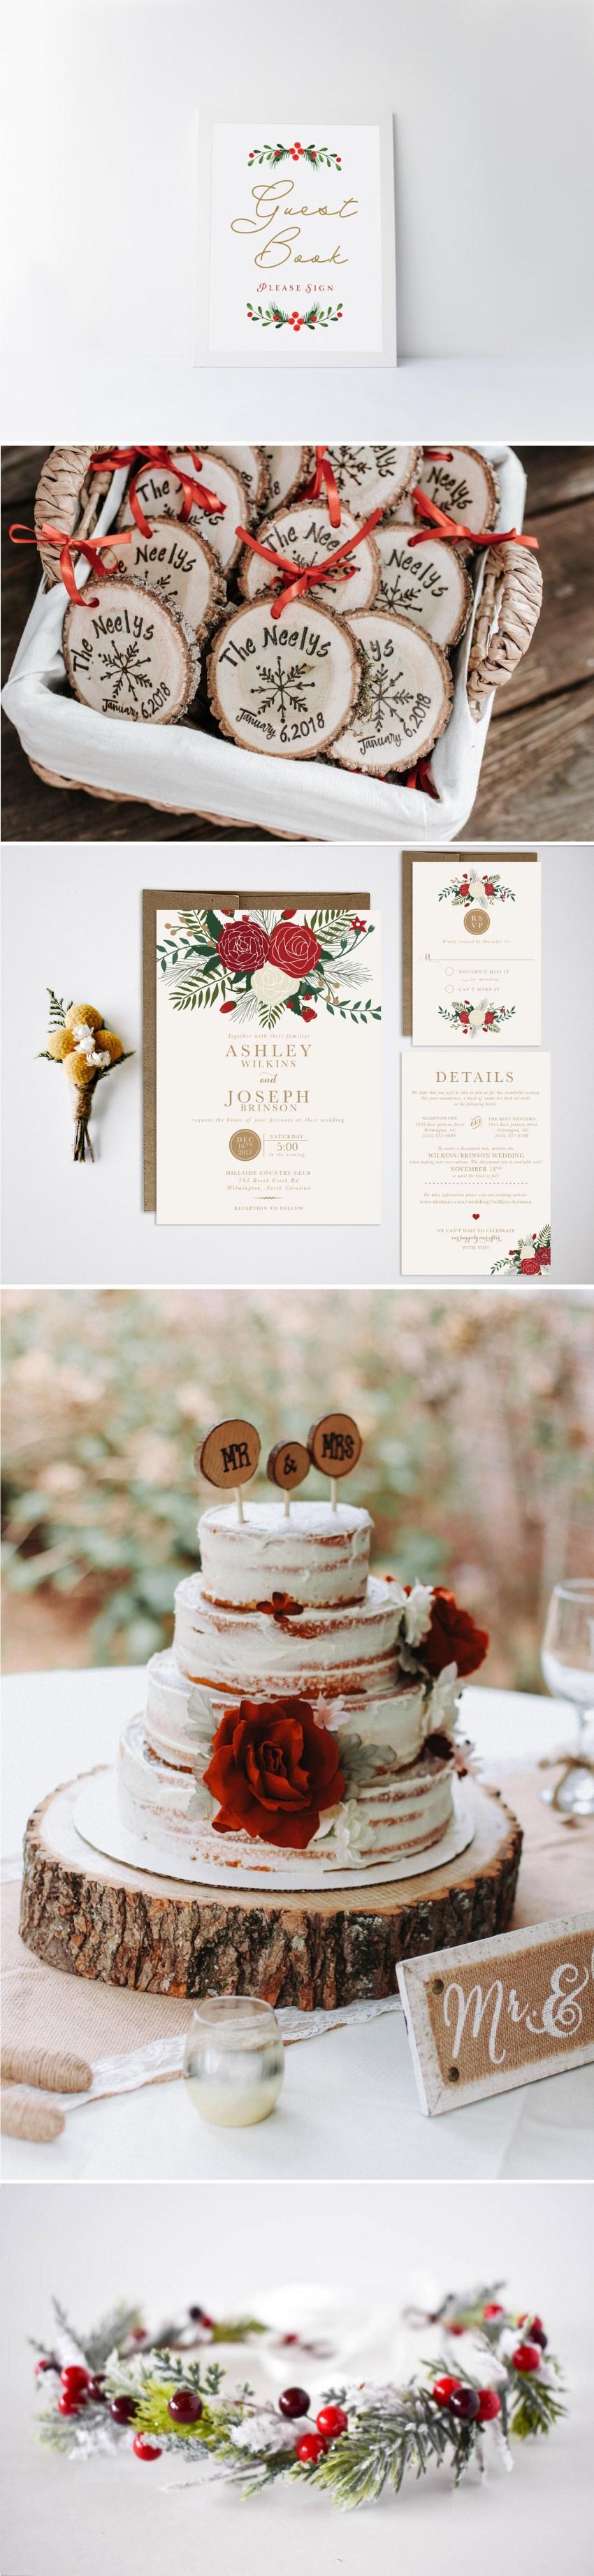 Christmas Wedding Ideas || Holiday Wedding || Winter Wedding || Red ...